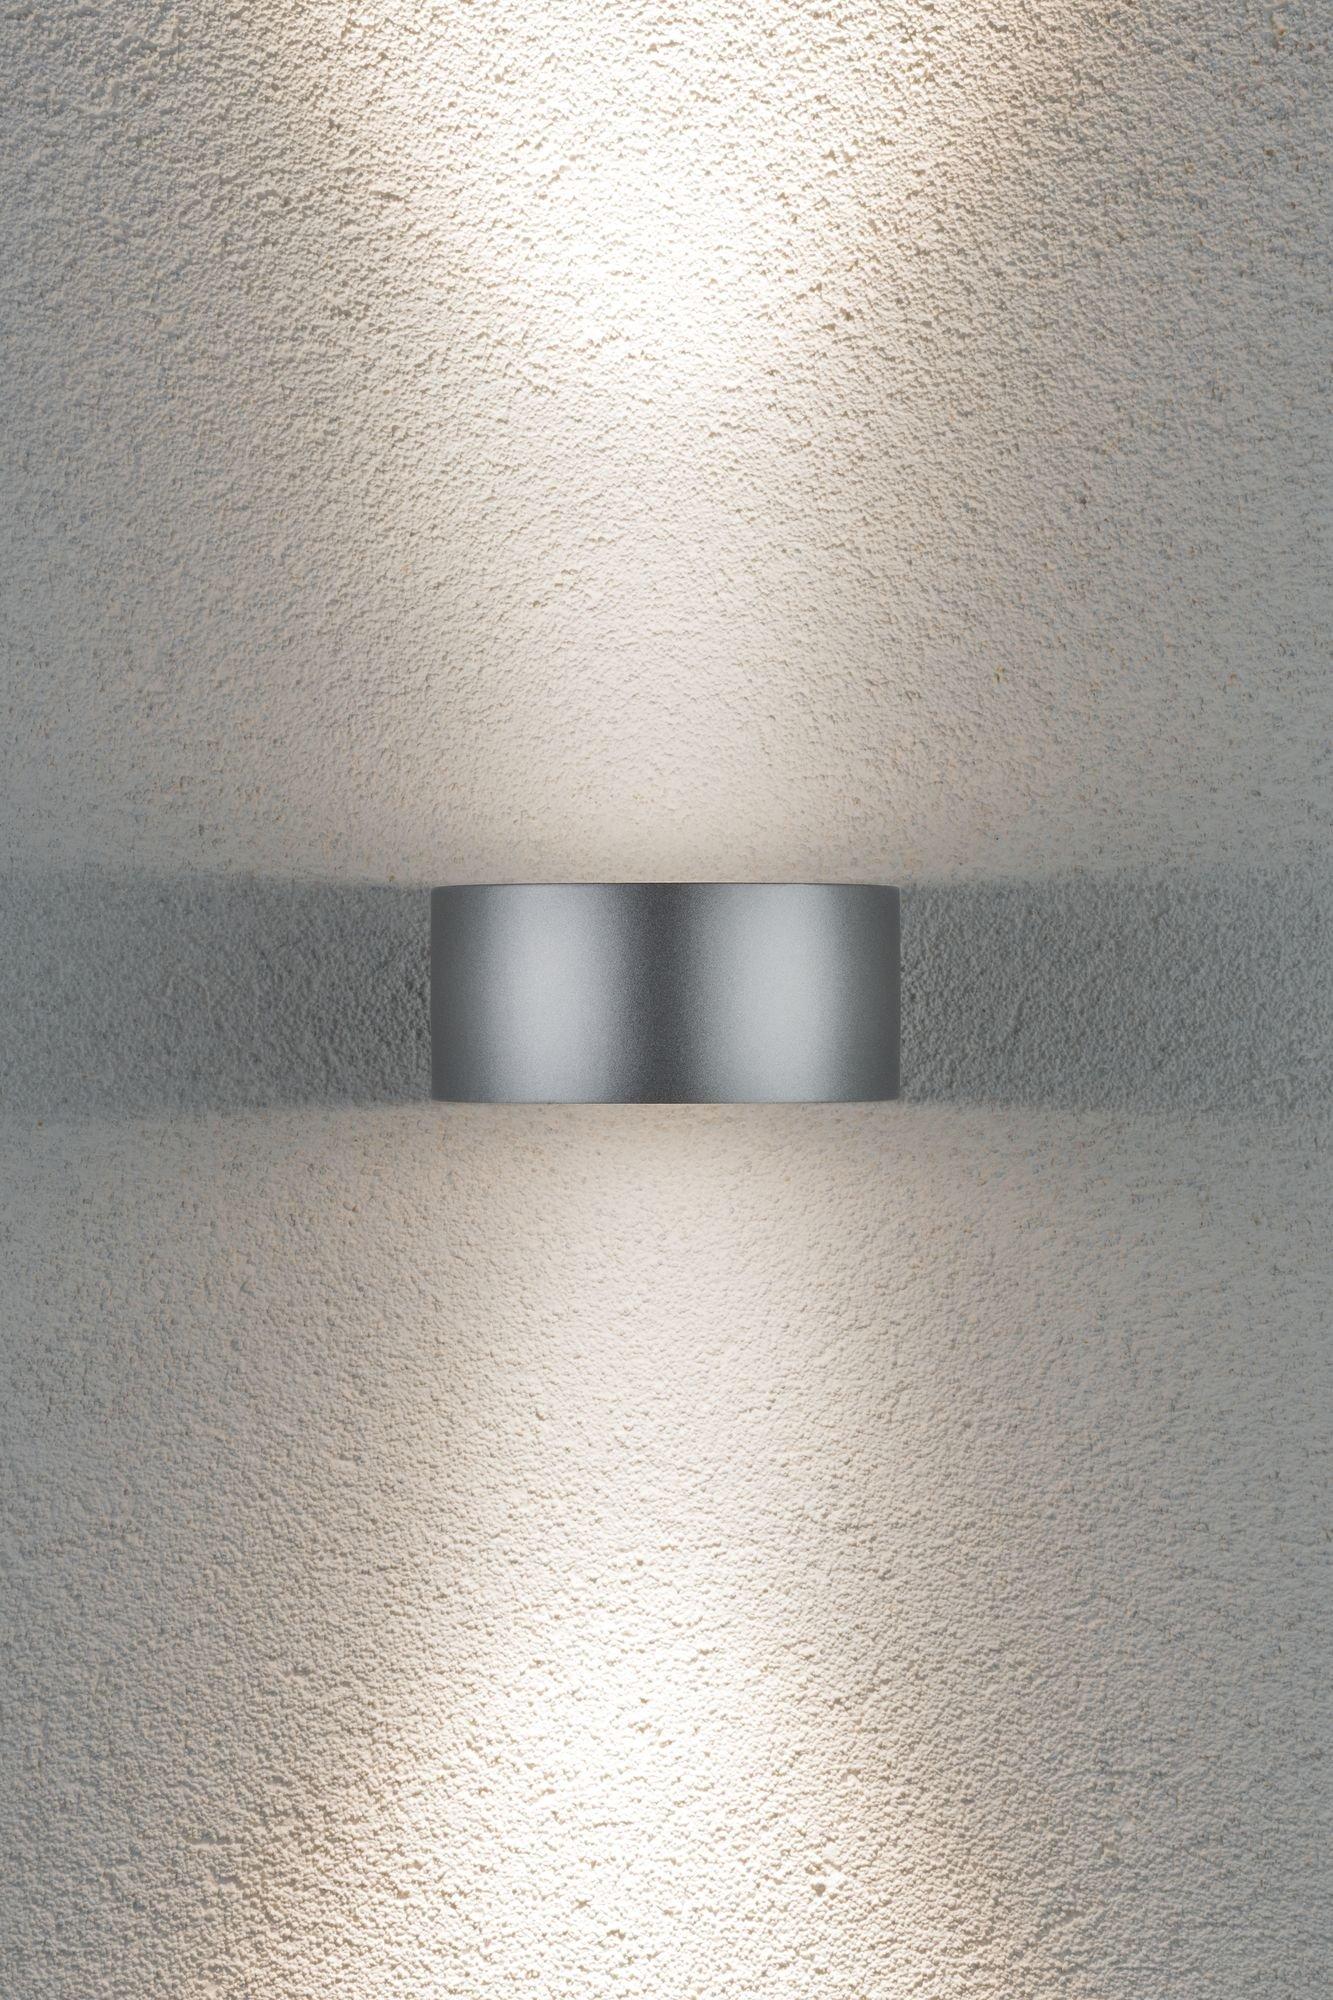 House wandlamp Cone IP44 3000K 2x6W zilver/ antraciet